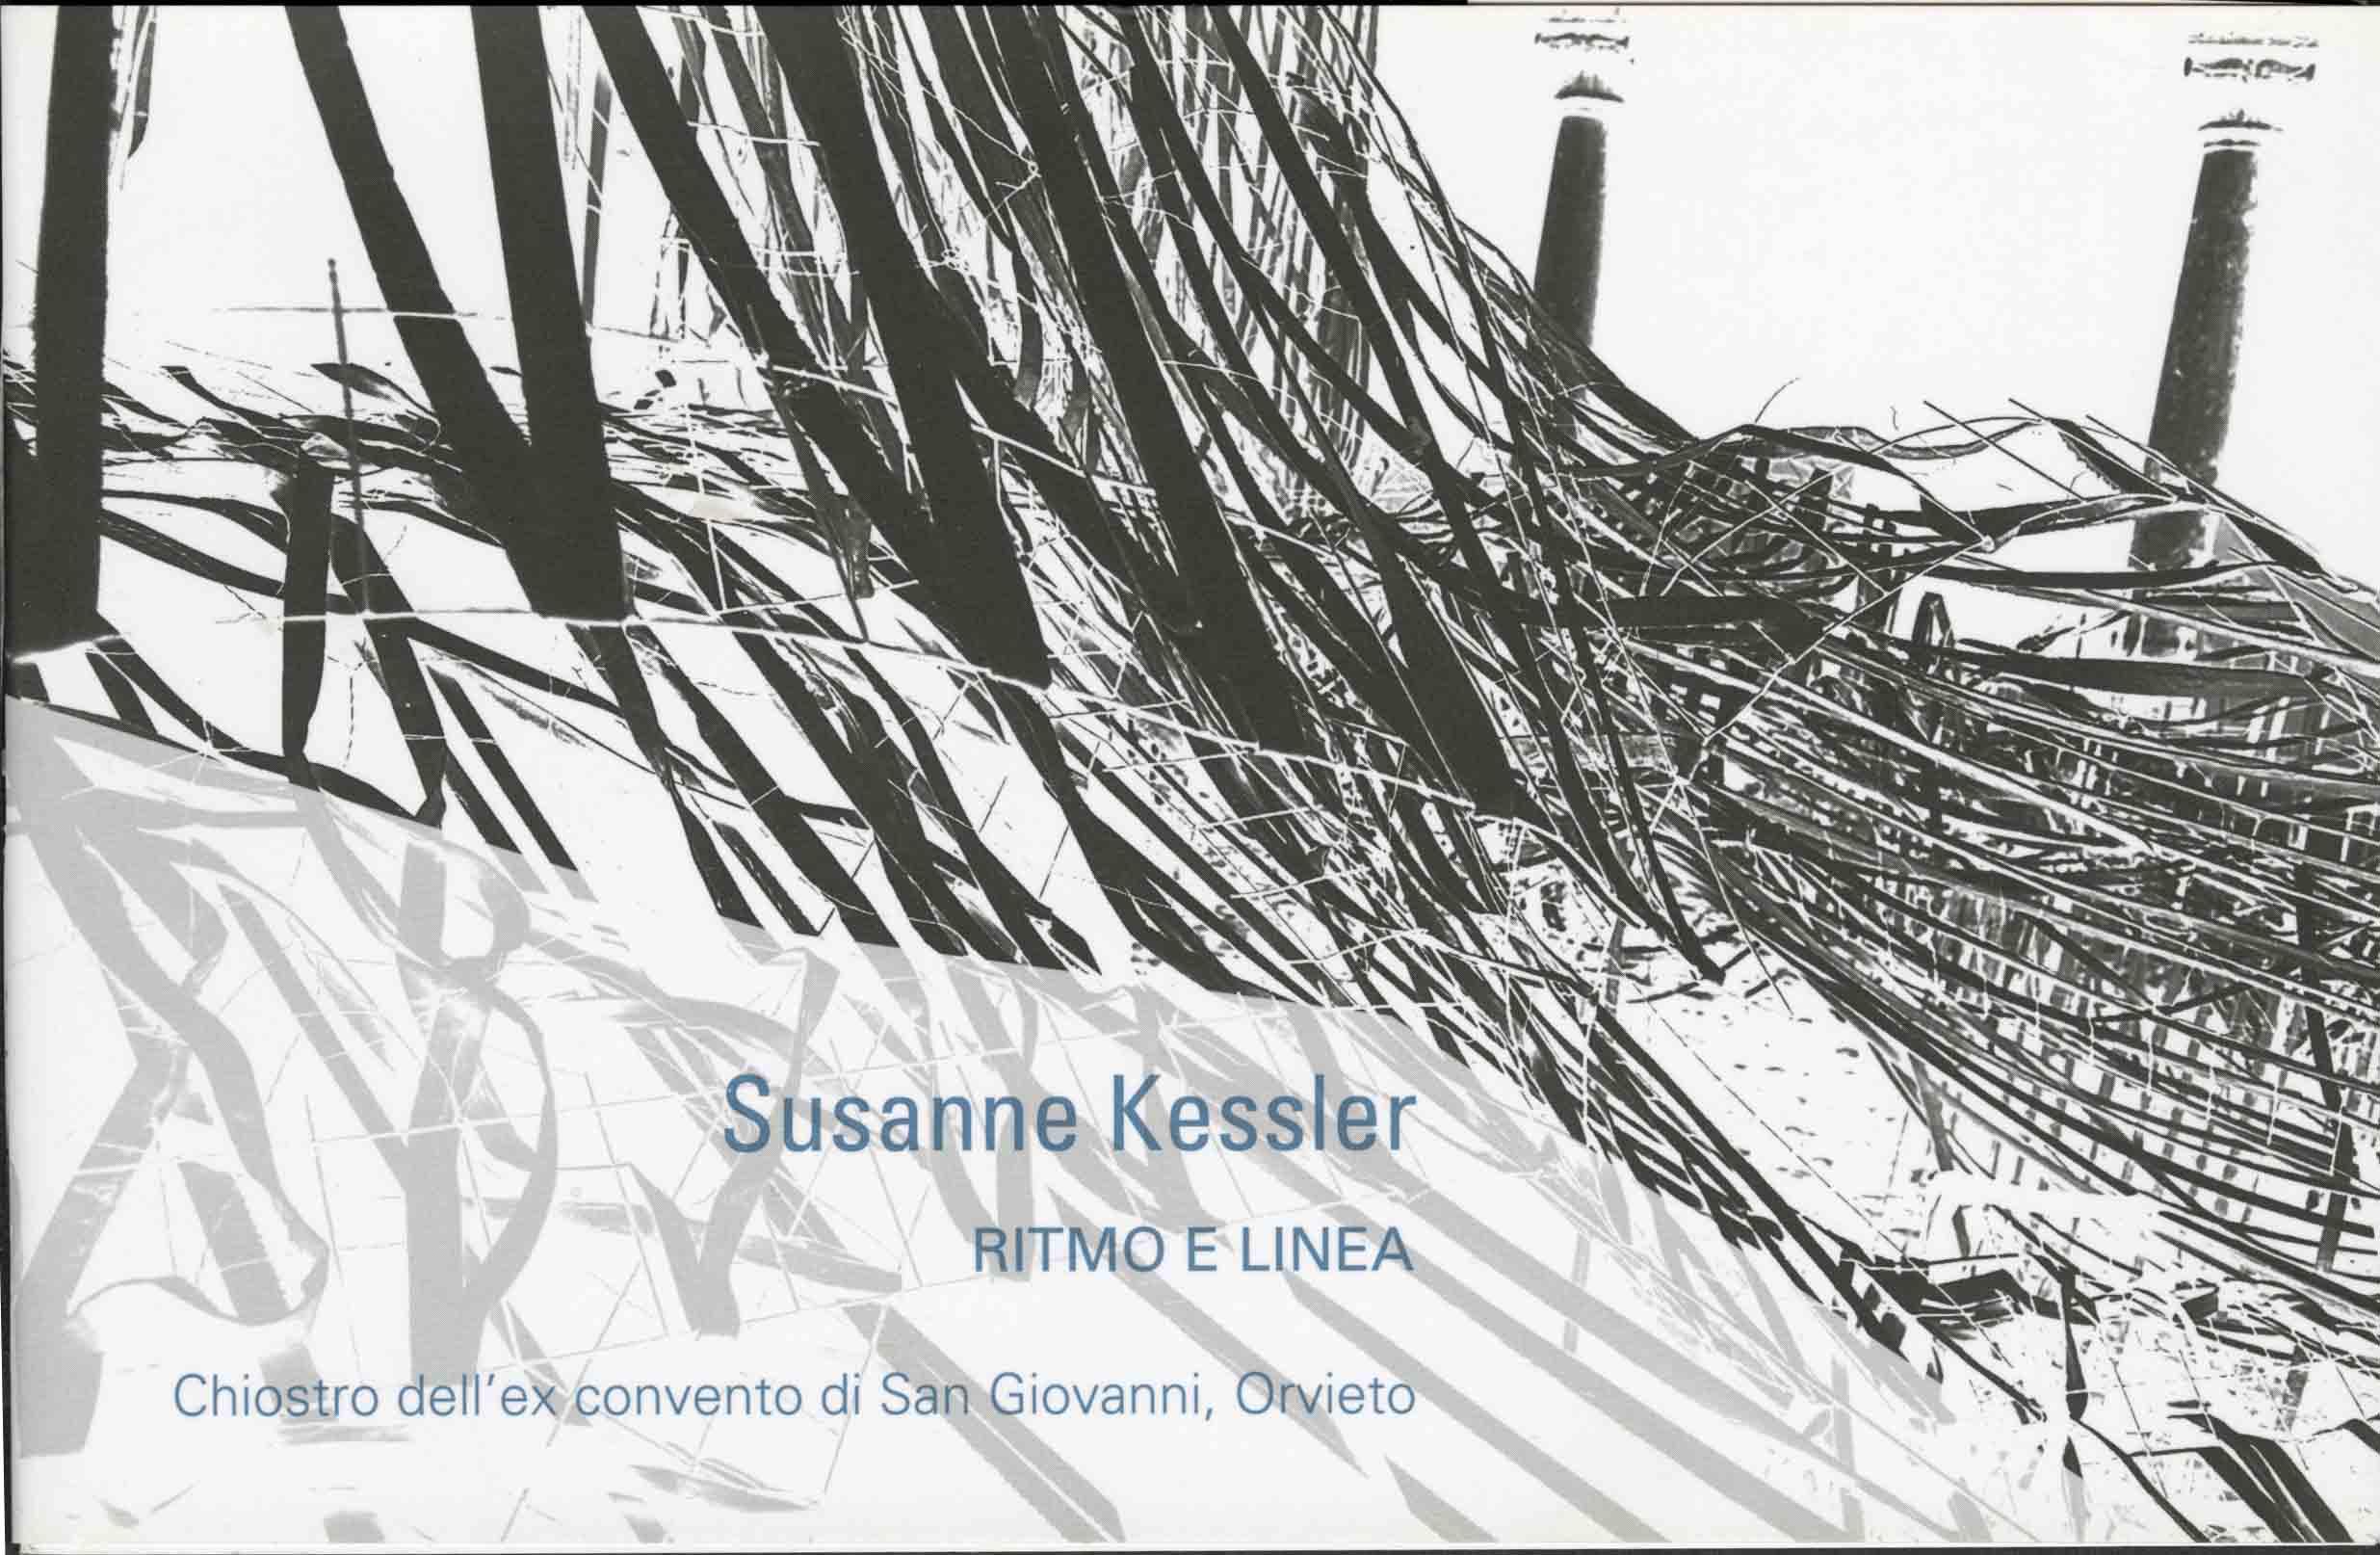 Susanne Kessler. Ritmo e Linea